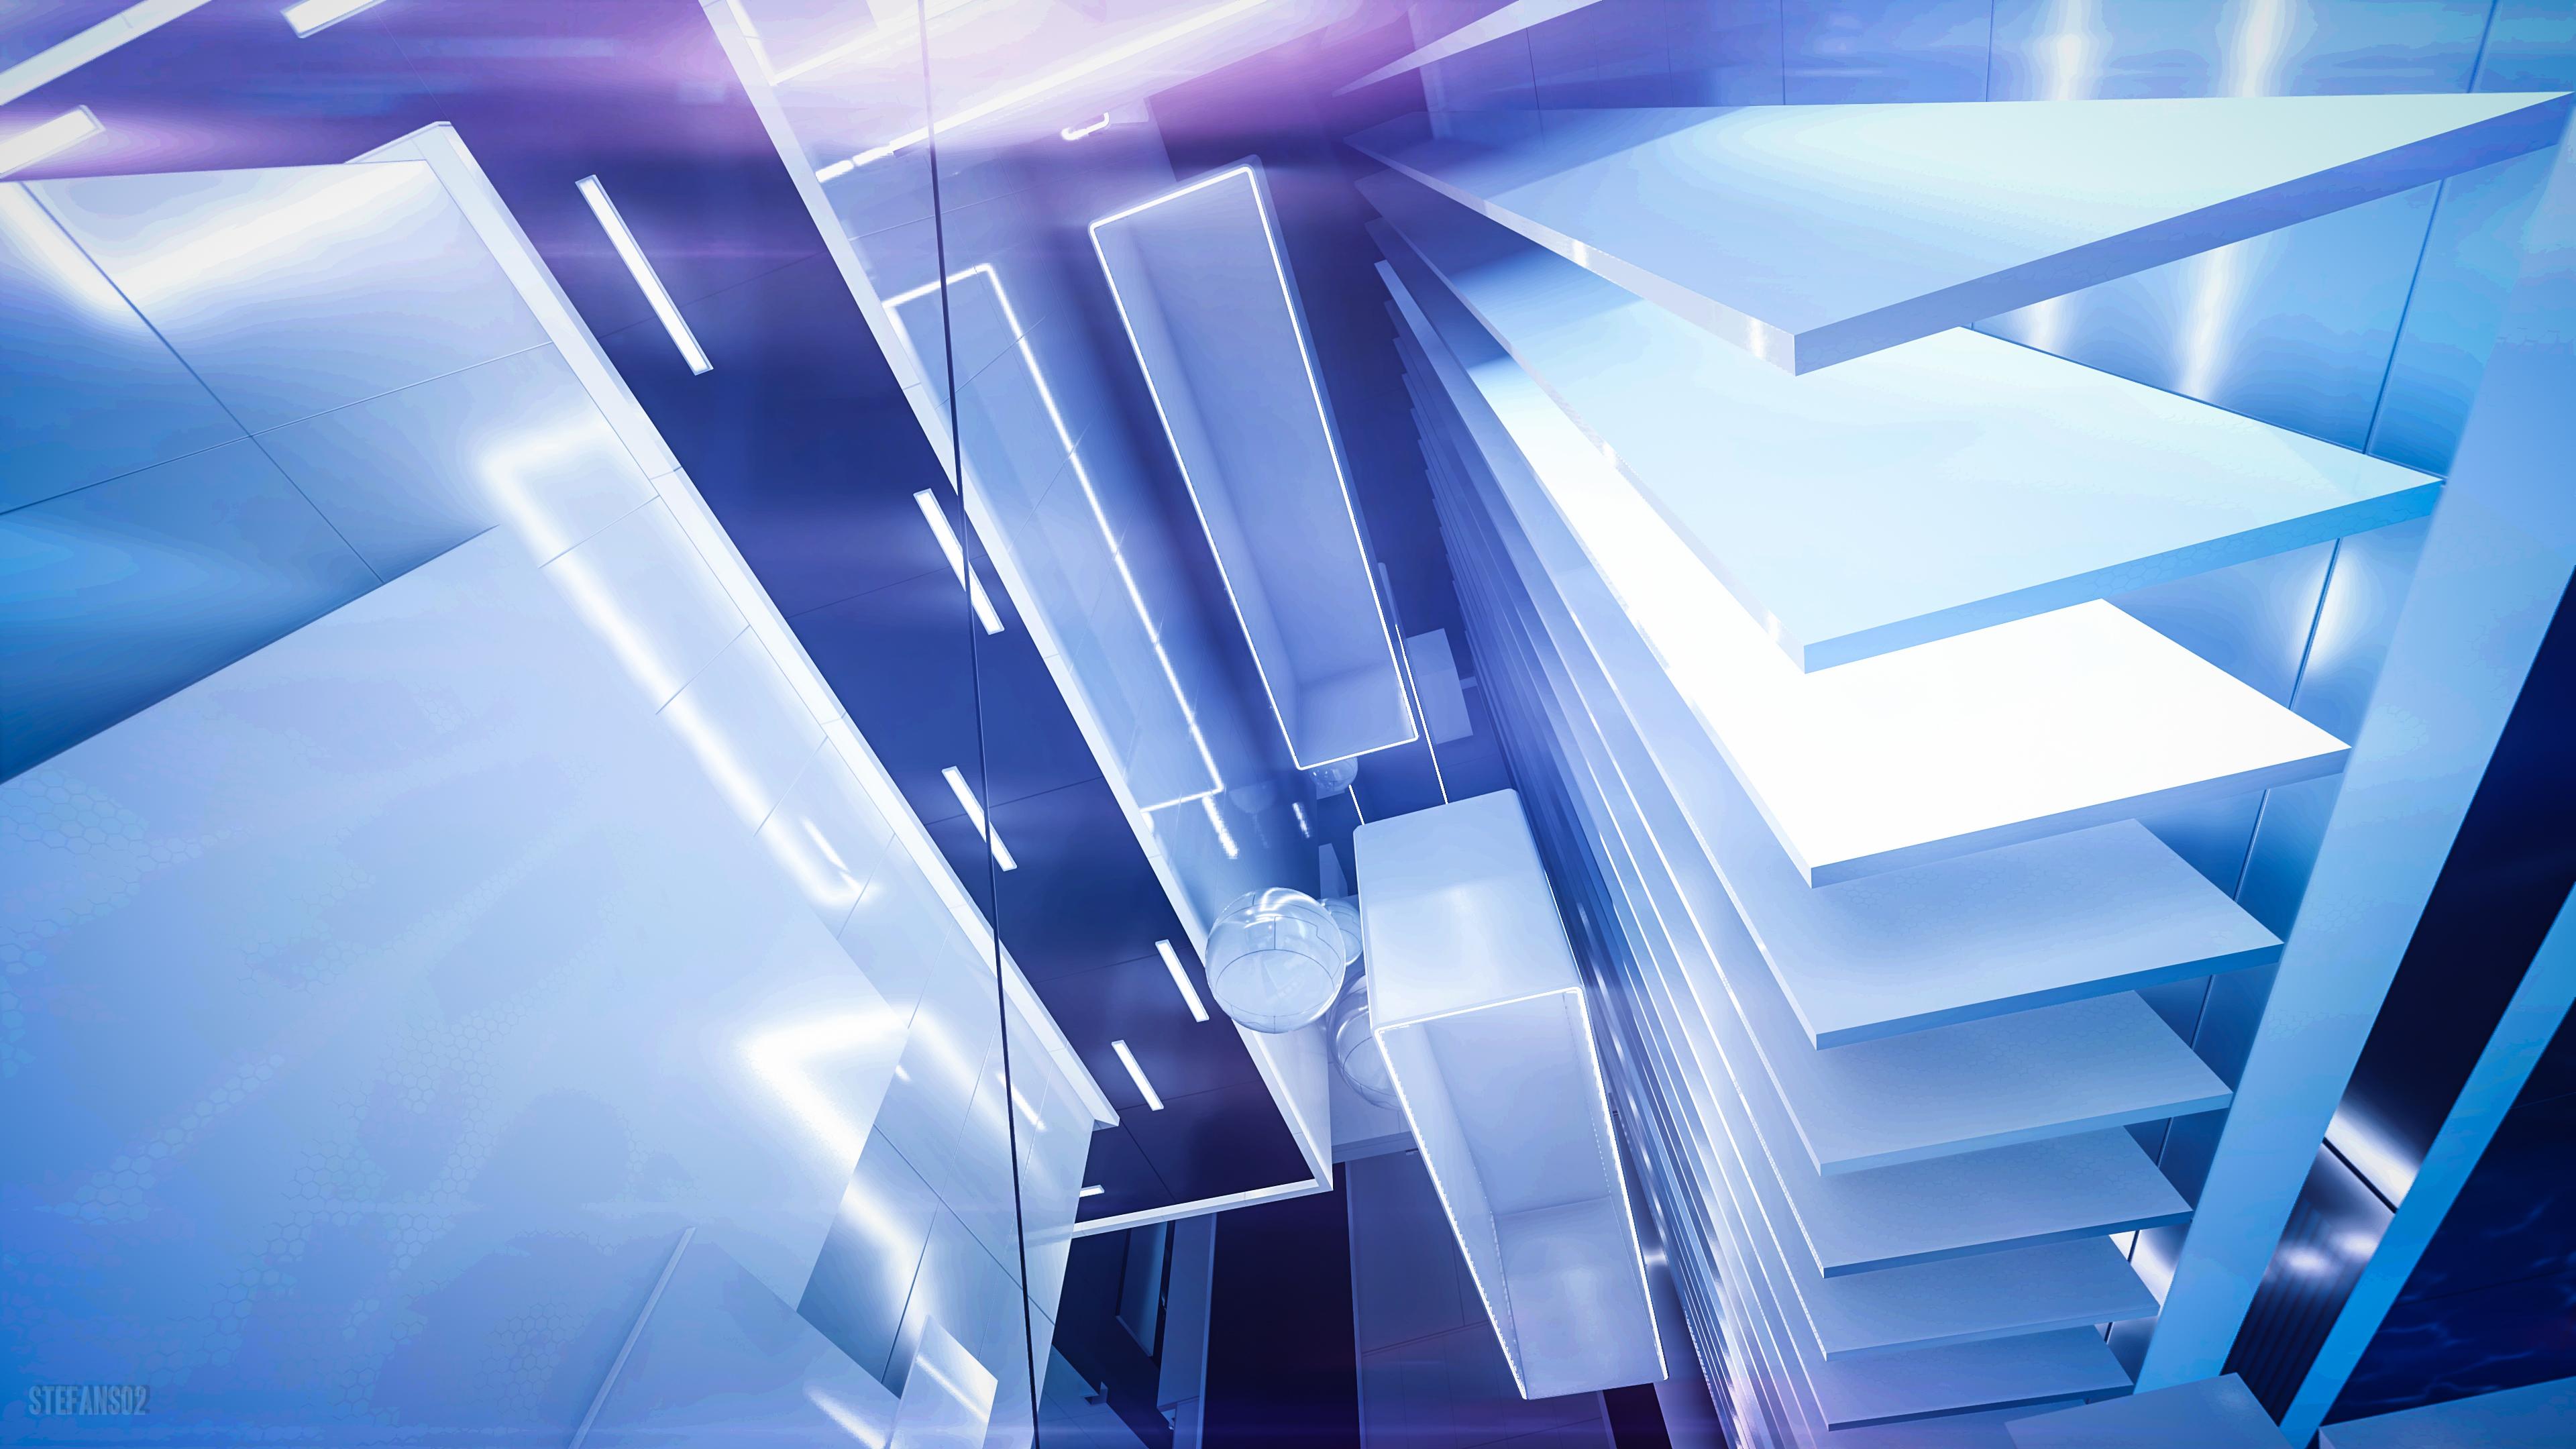 Mirror S Edge Catalyst 4k Ultra Hd Wallpaper Background Image